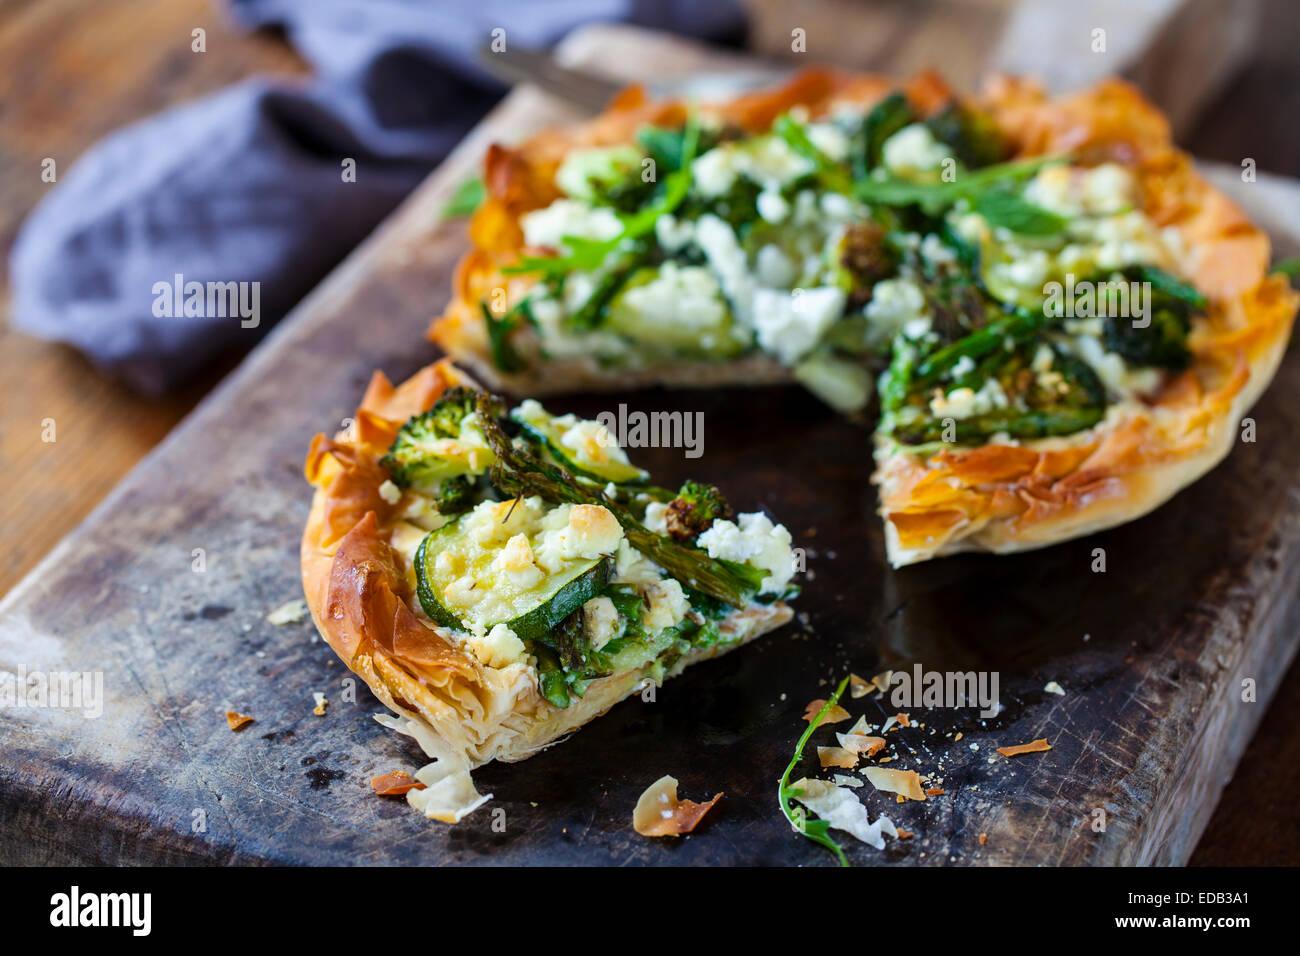 Filo tarta de hojaldre con las verduras asadas Imagen De Stock